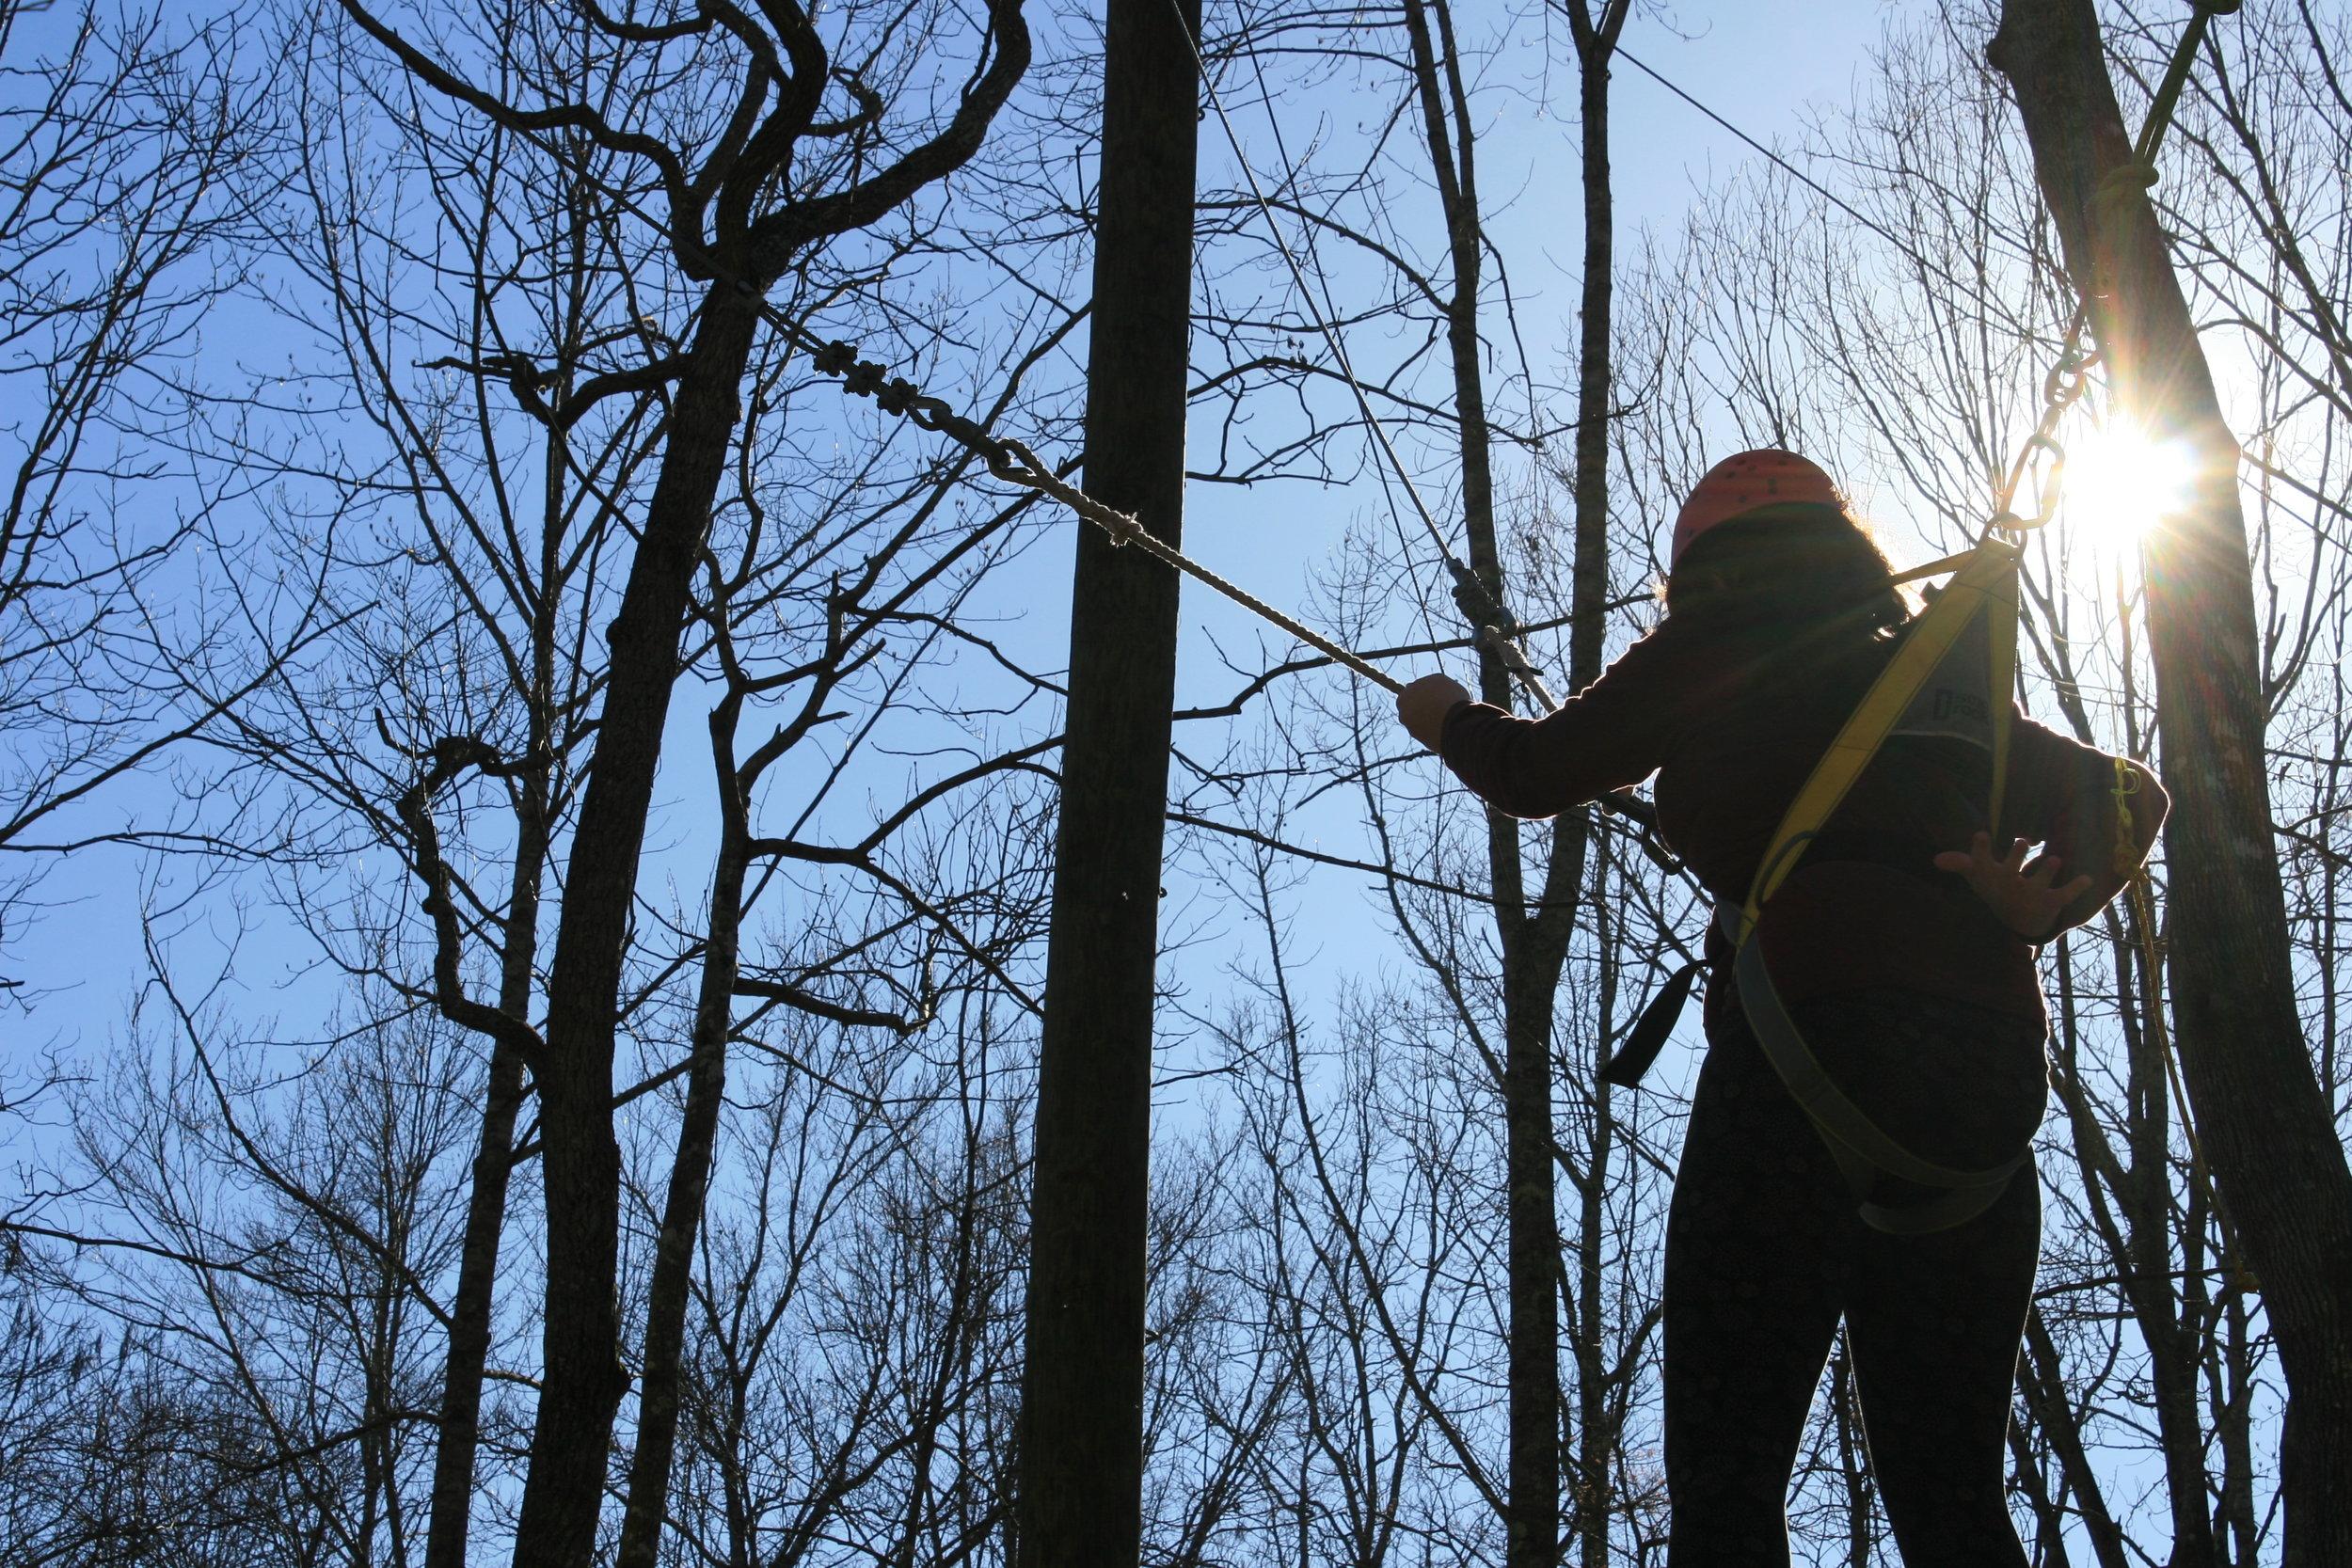 NaCoMe's Fall Youth Retreat